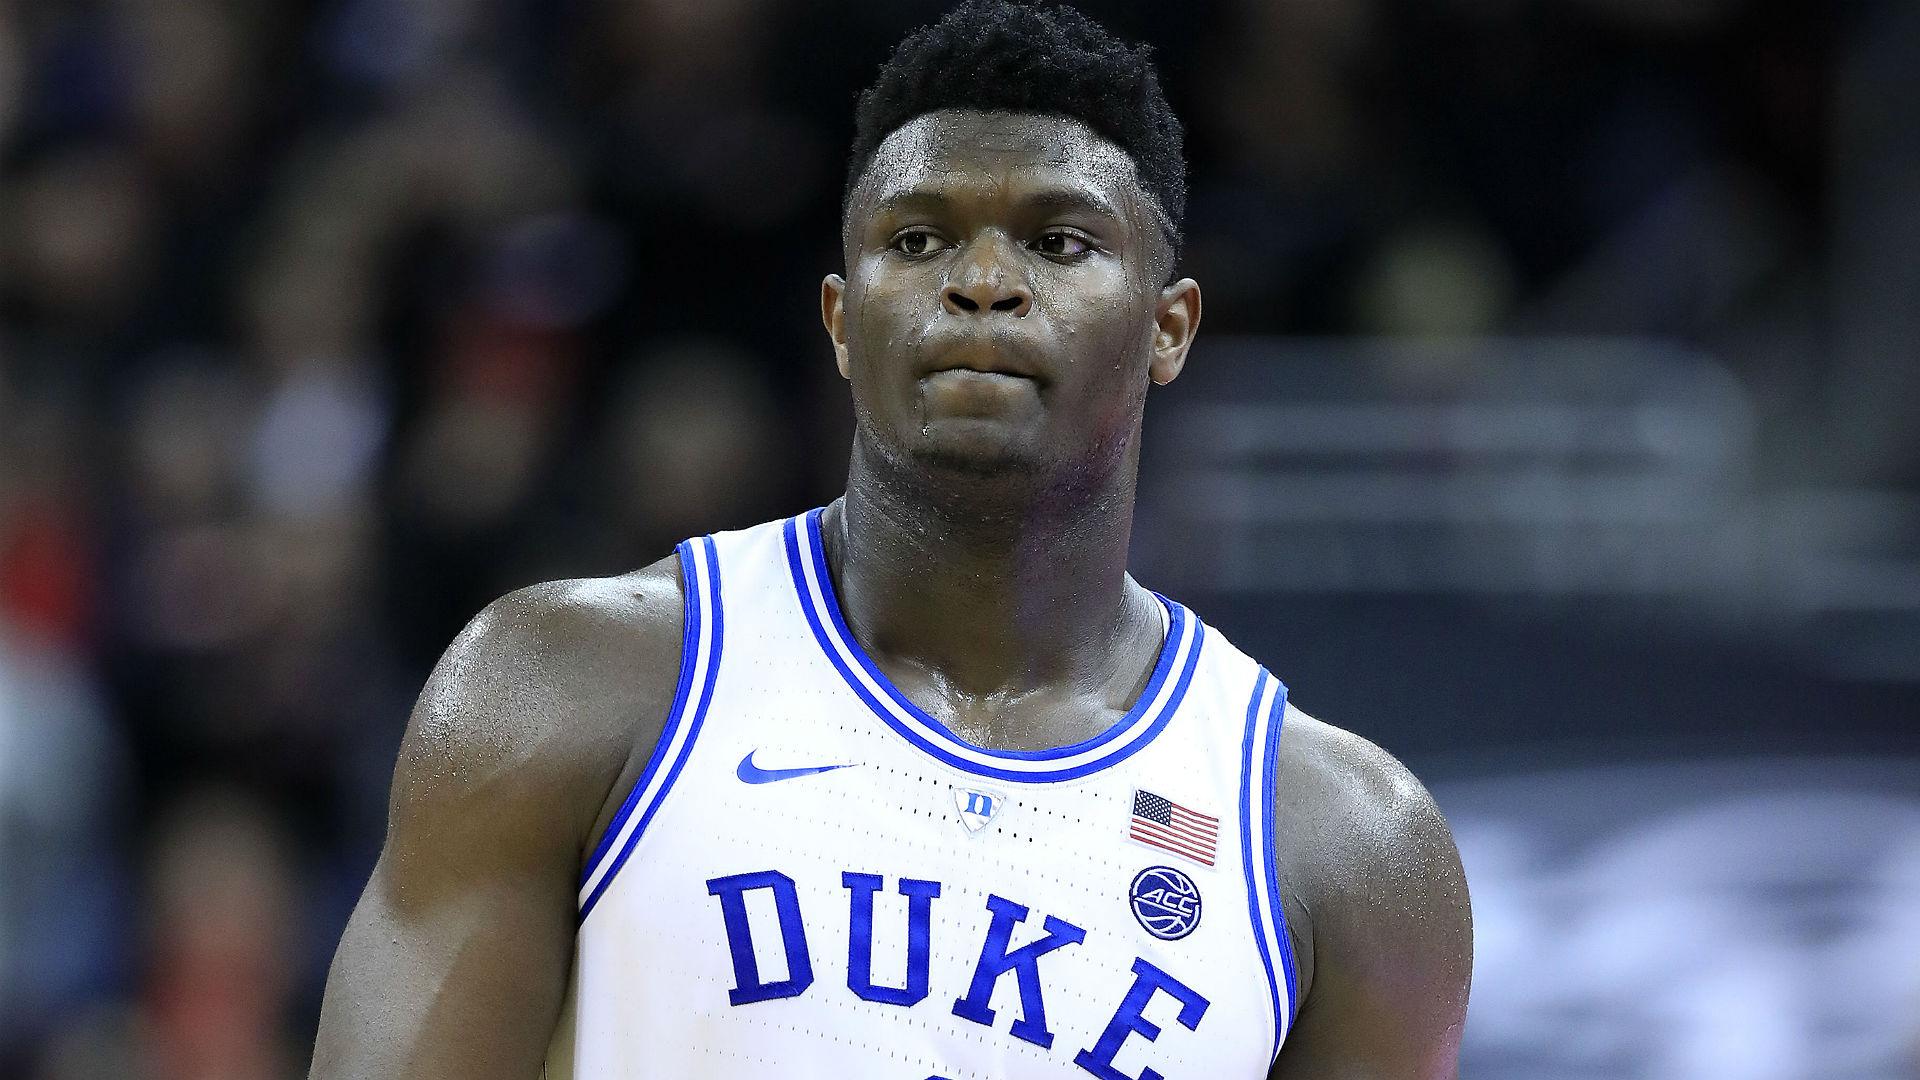 Zion若是退出選秀會有什麼後果?ESPN:他將永遠無緣NBA!